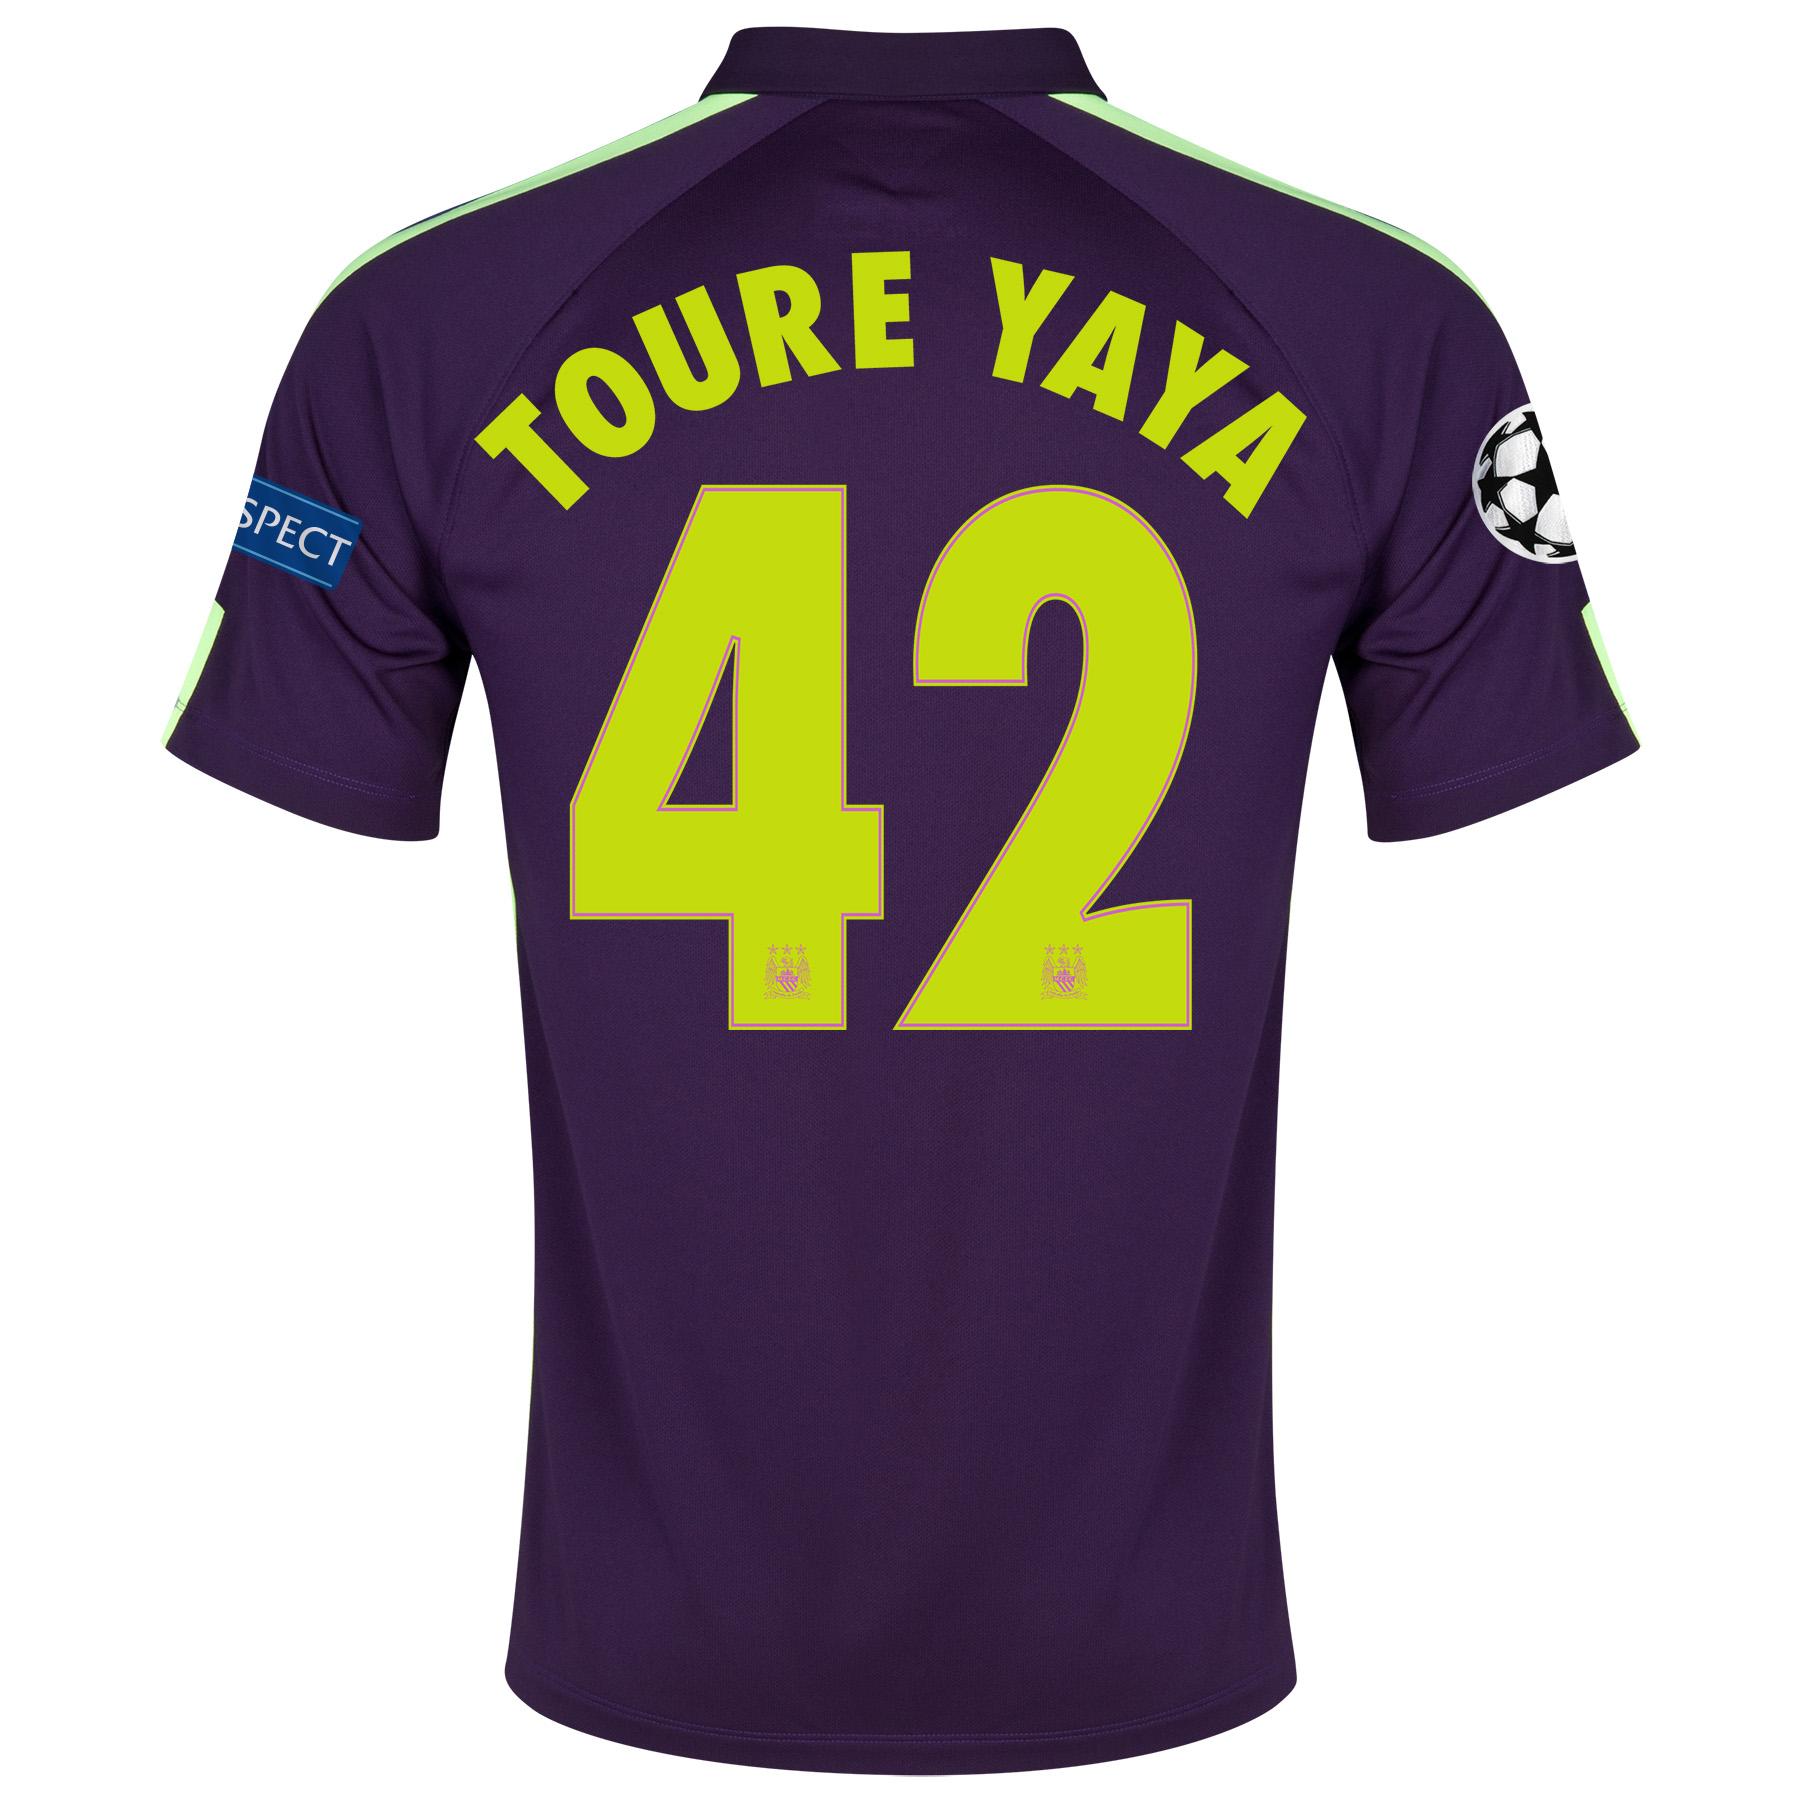 Manchester City UEFA Champions League Cup Away Shirt 2014/15 Purple with Toure Yaya 42 printing